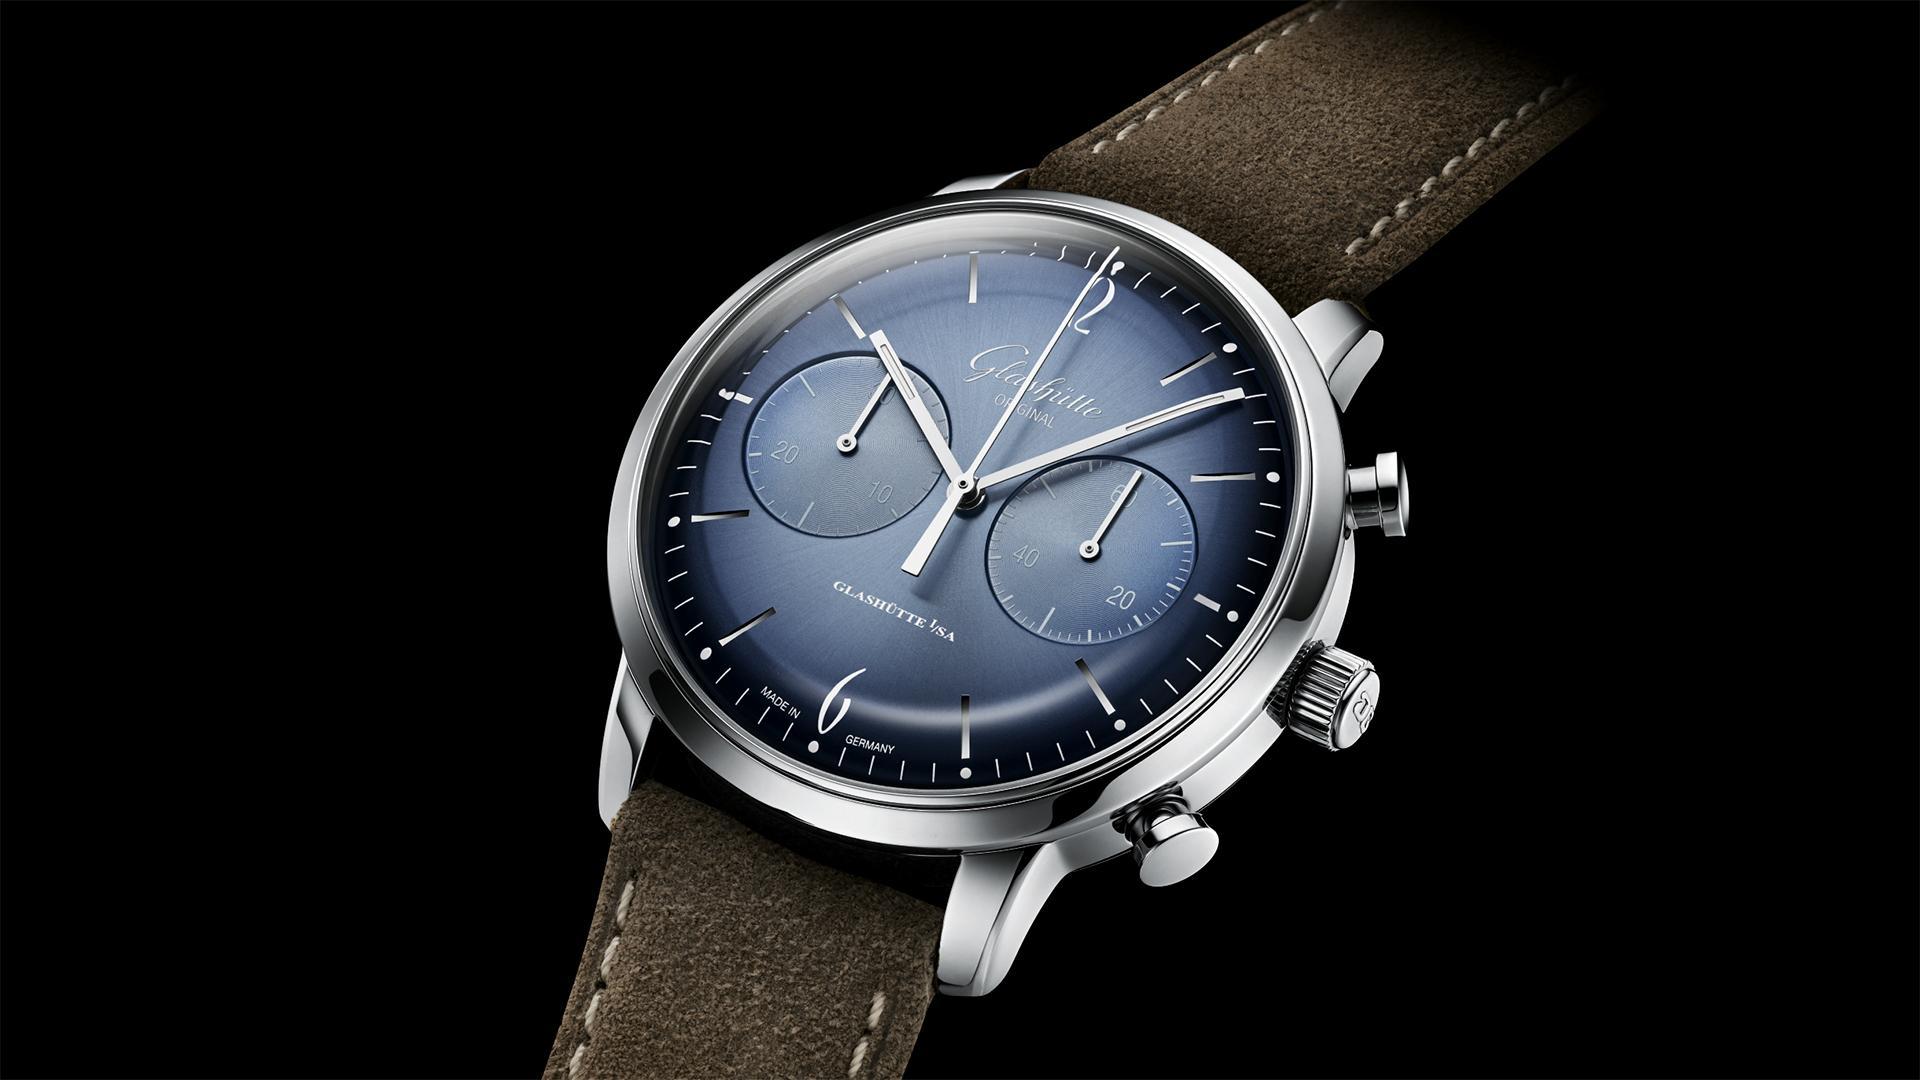 Glashütte Original Sixties Chronograph watch